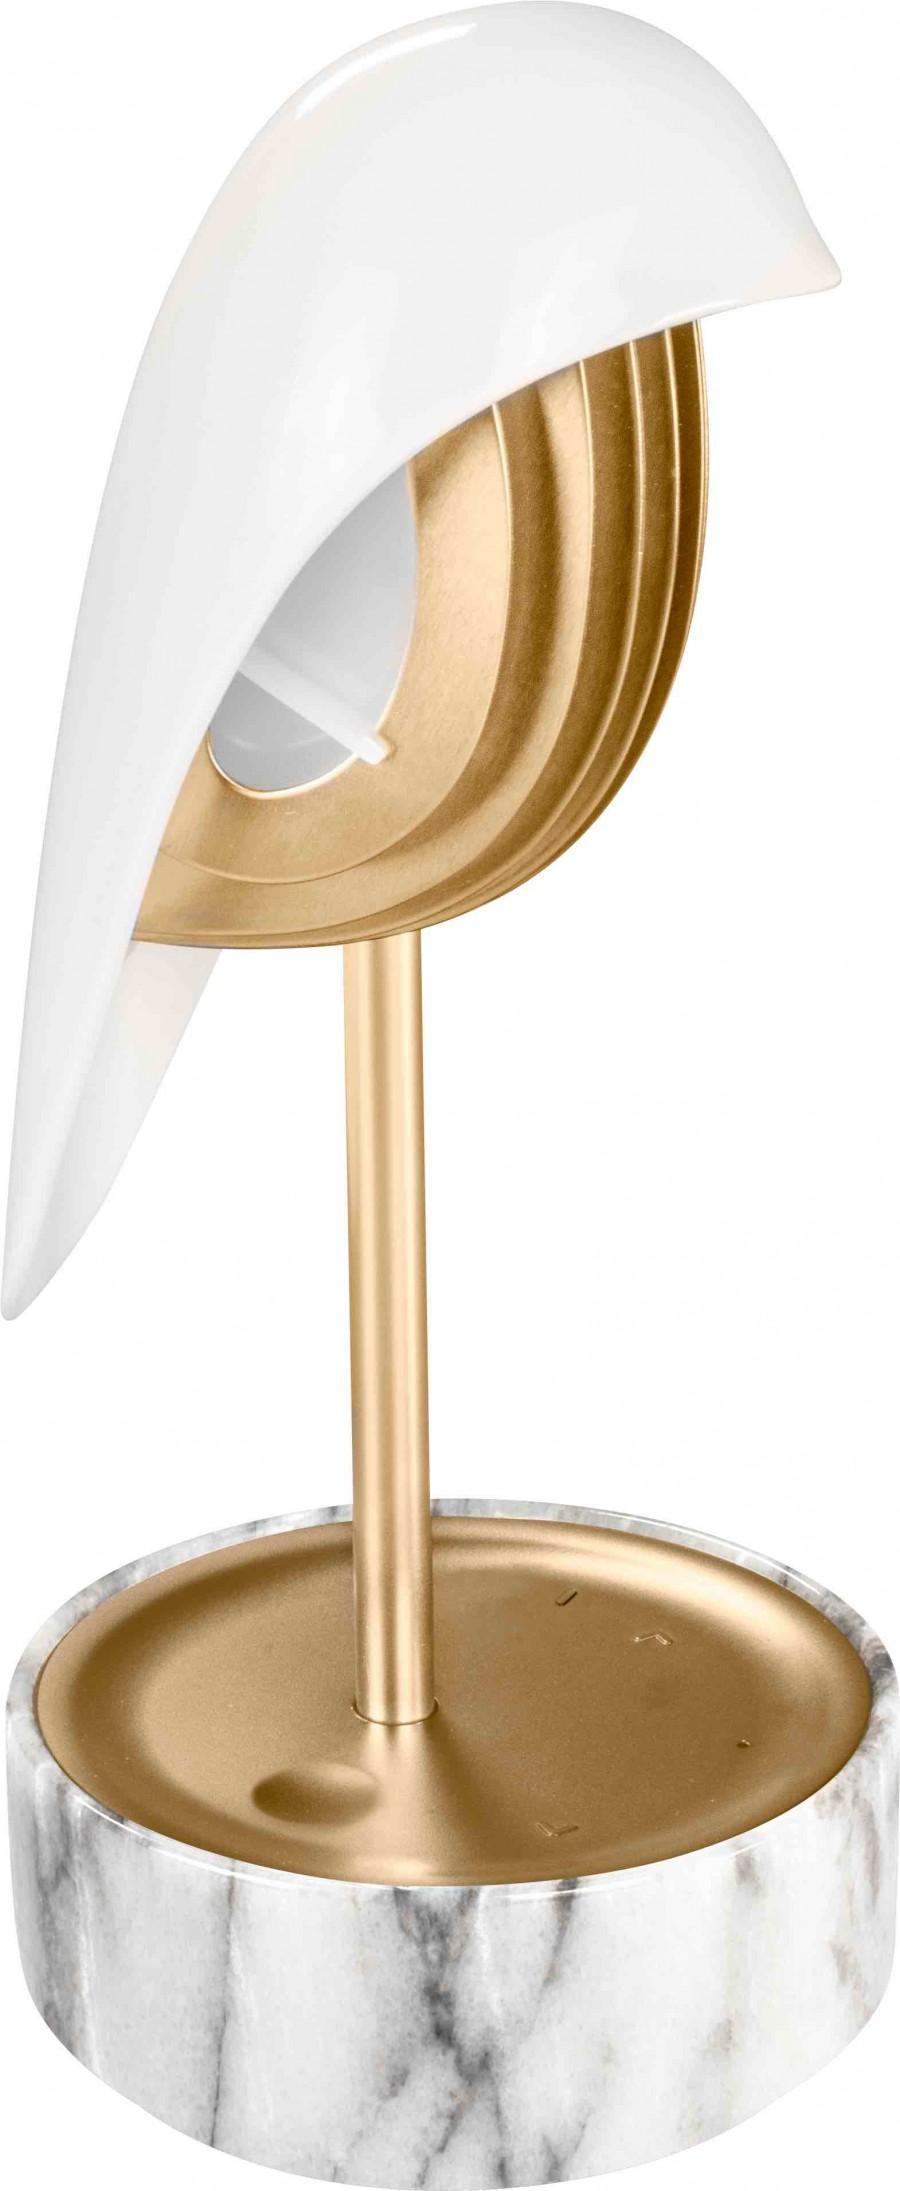 Daqi Concept Chirp White Gold